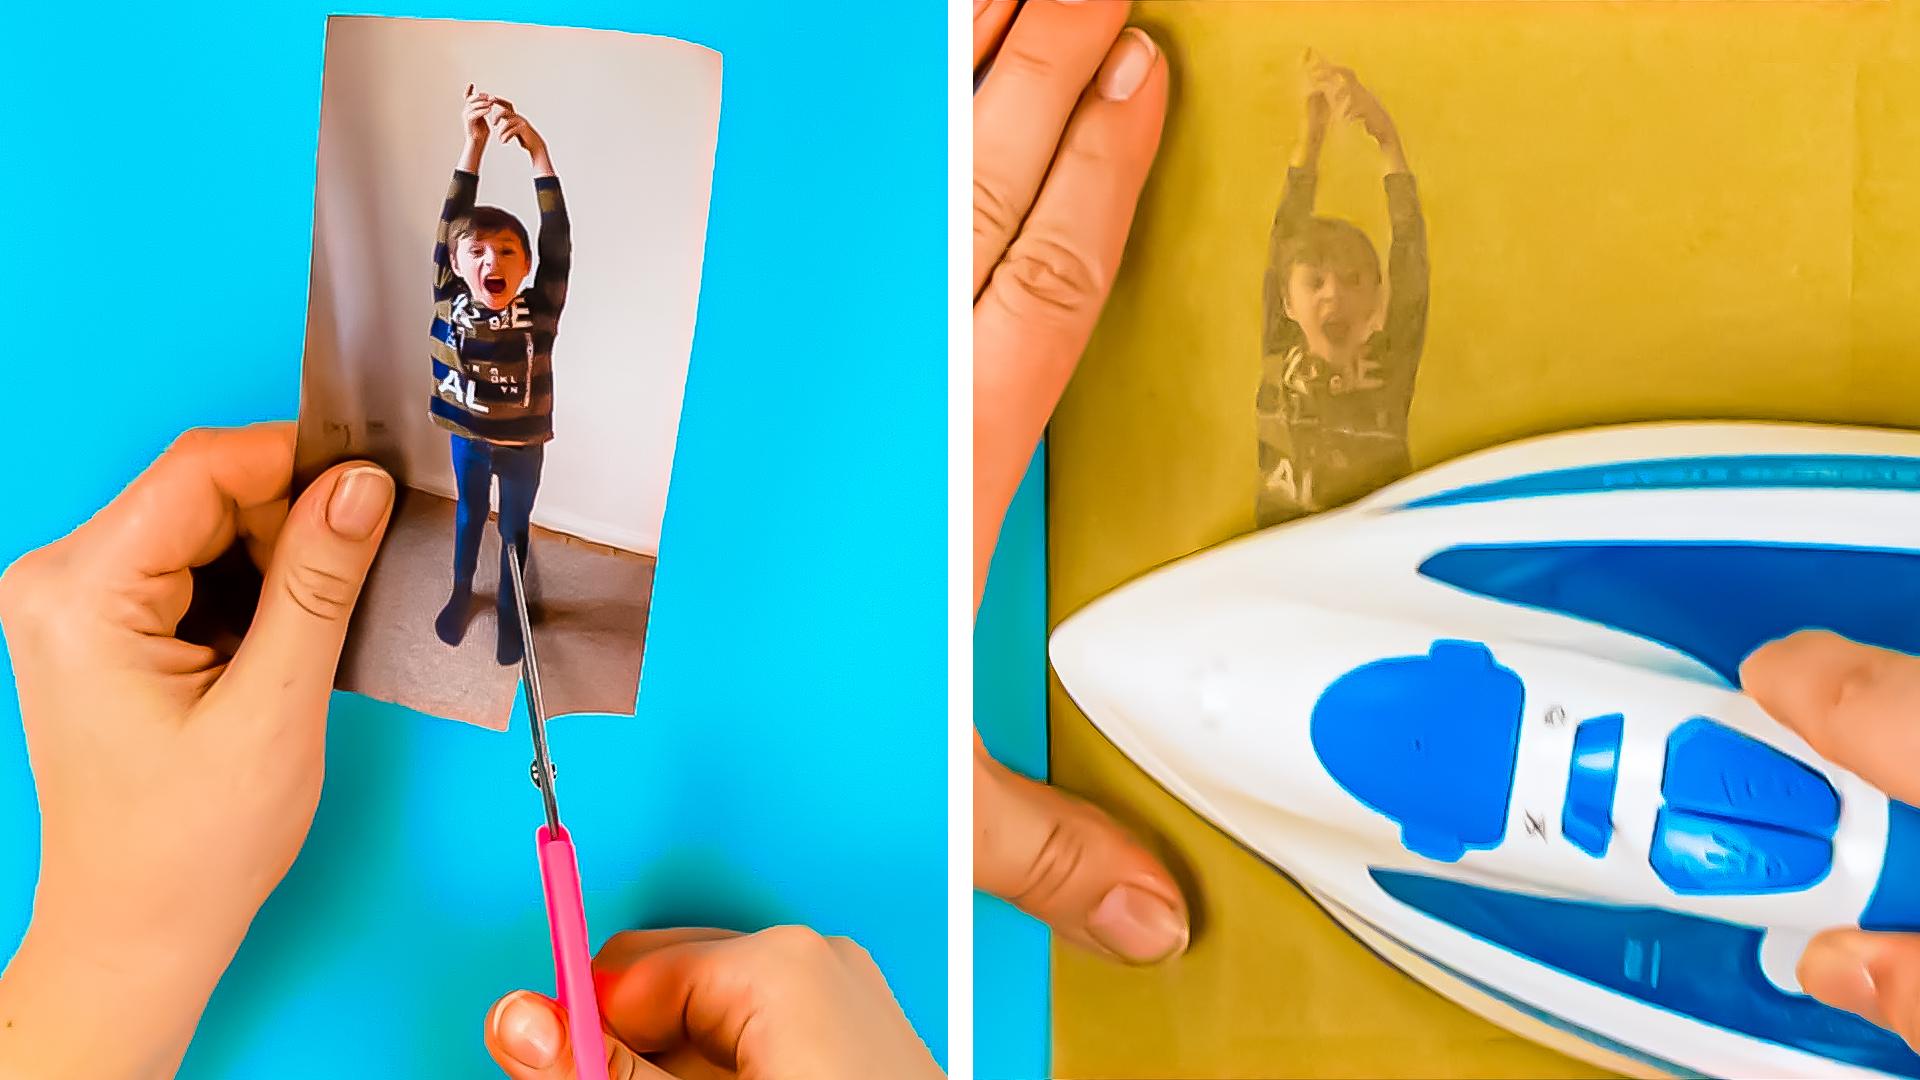 Kreative Fotogeschenke zum Muttertag | Bastelideen mit Fotos